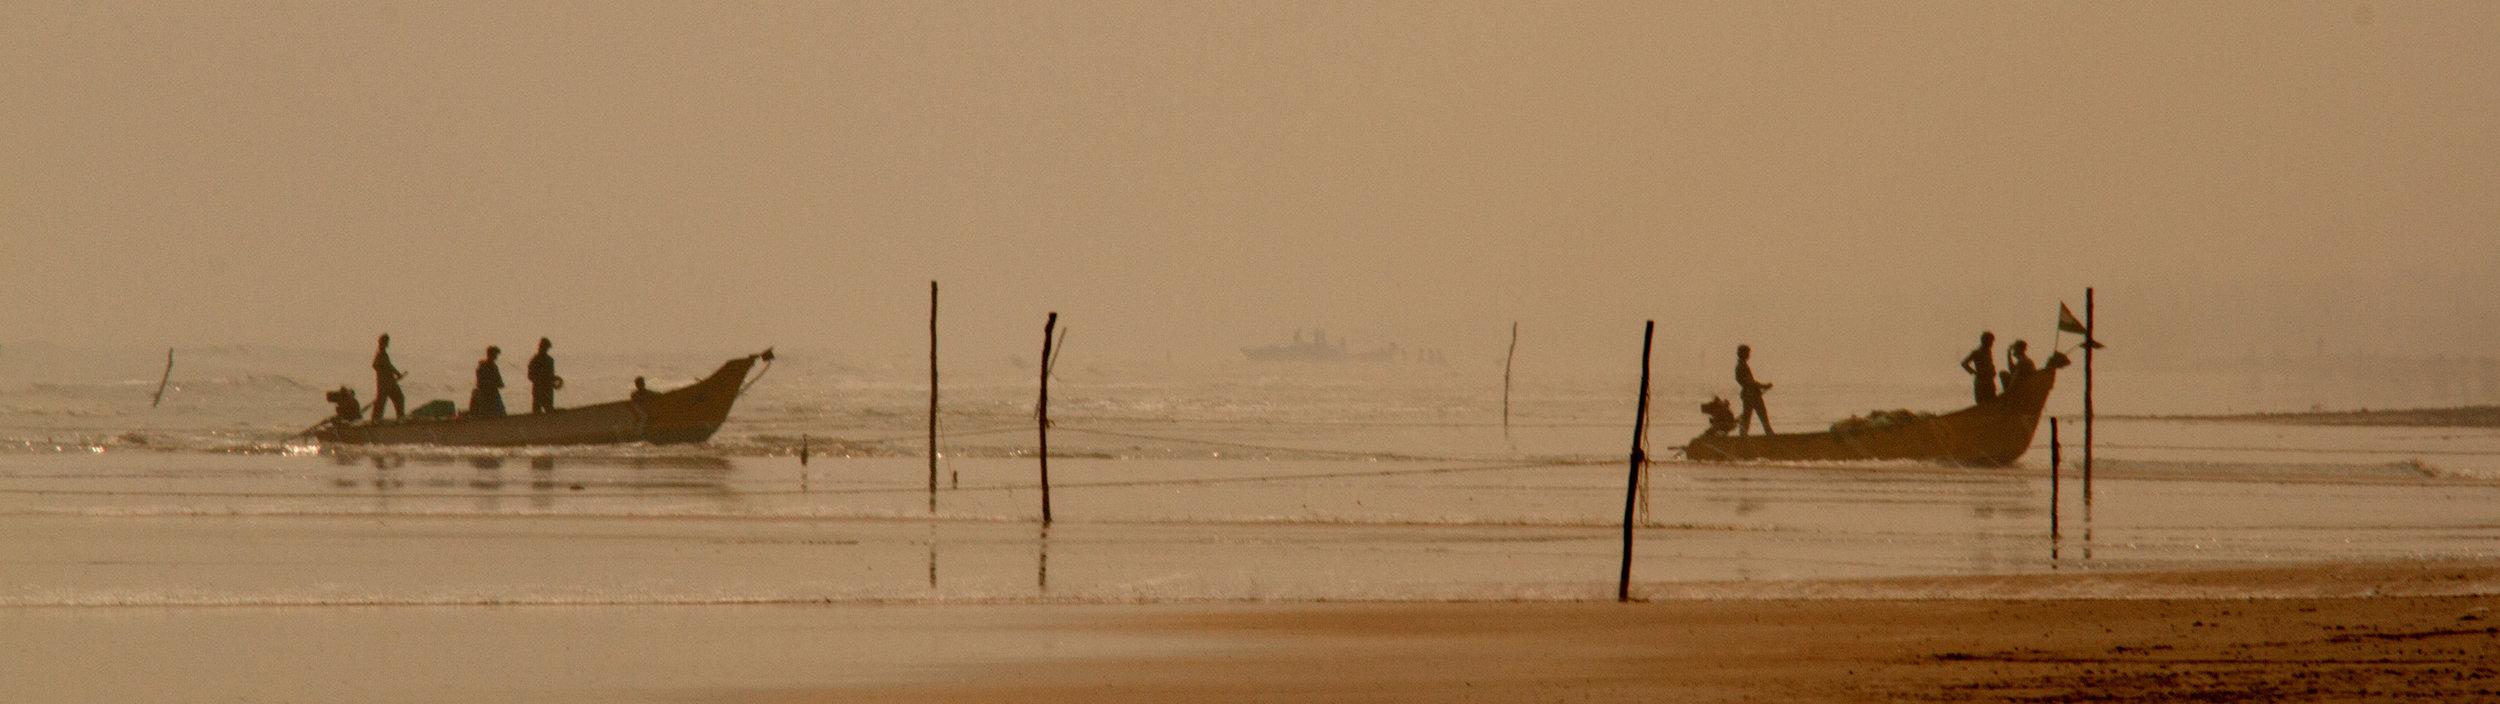 Fishing boats coming home.